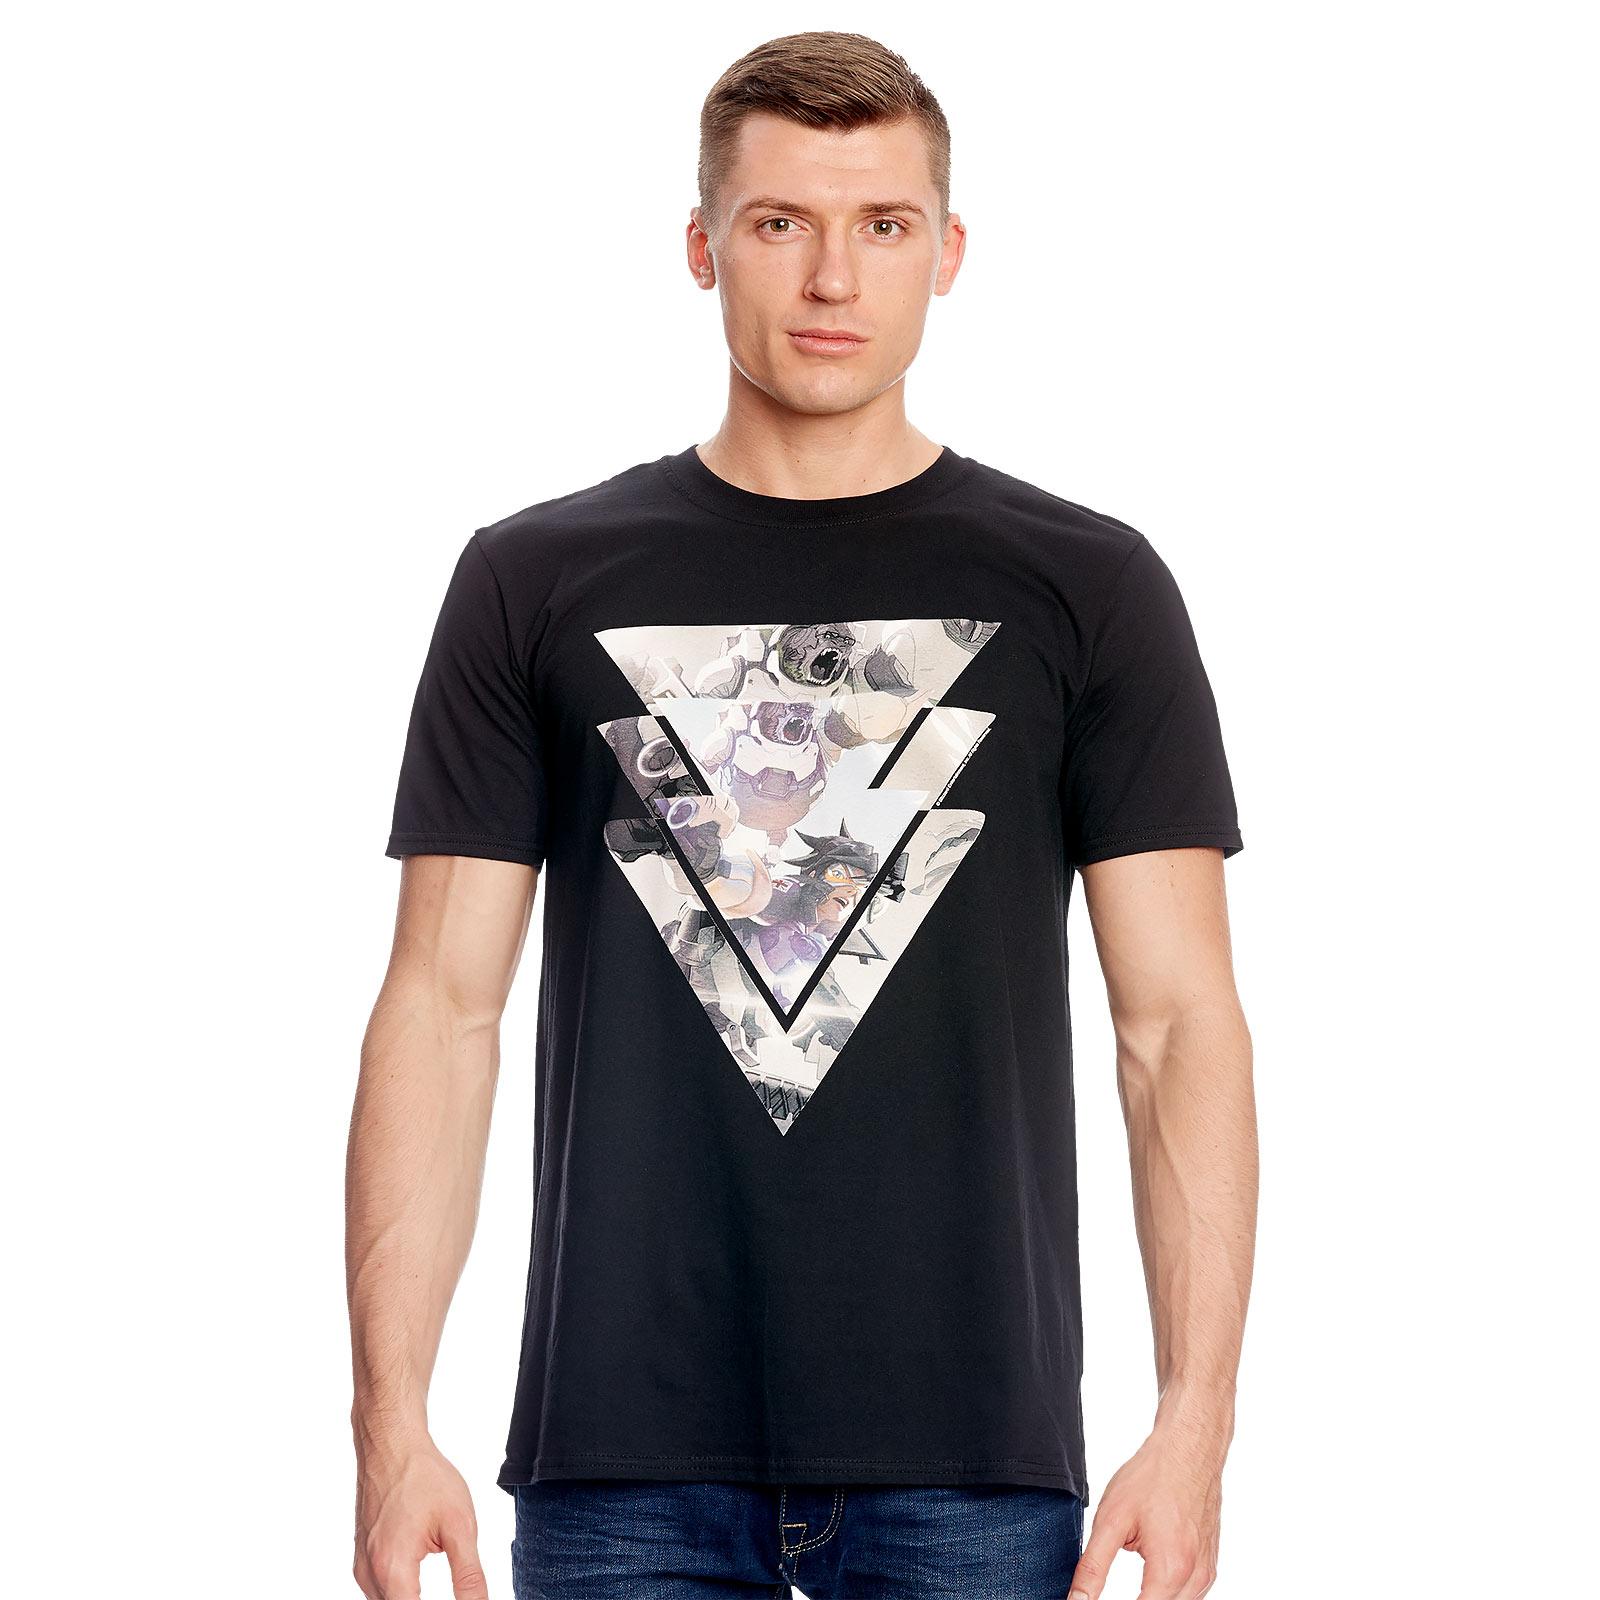 Overwatch - For the Good T-Shirt schwarz